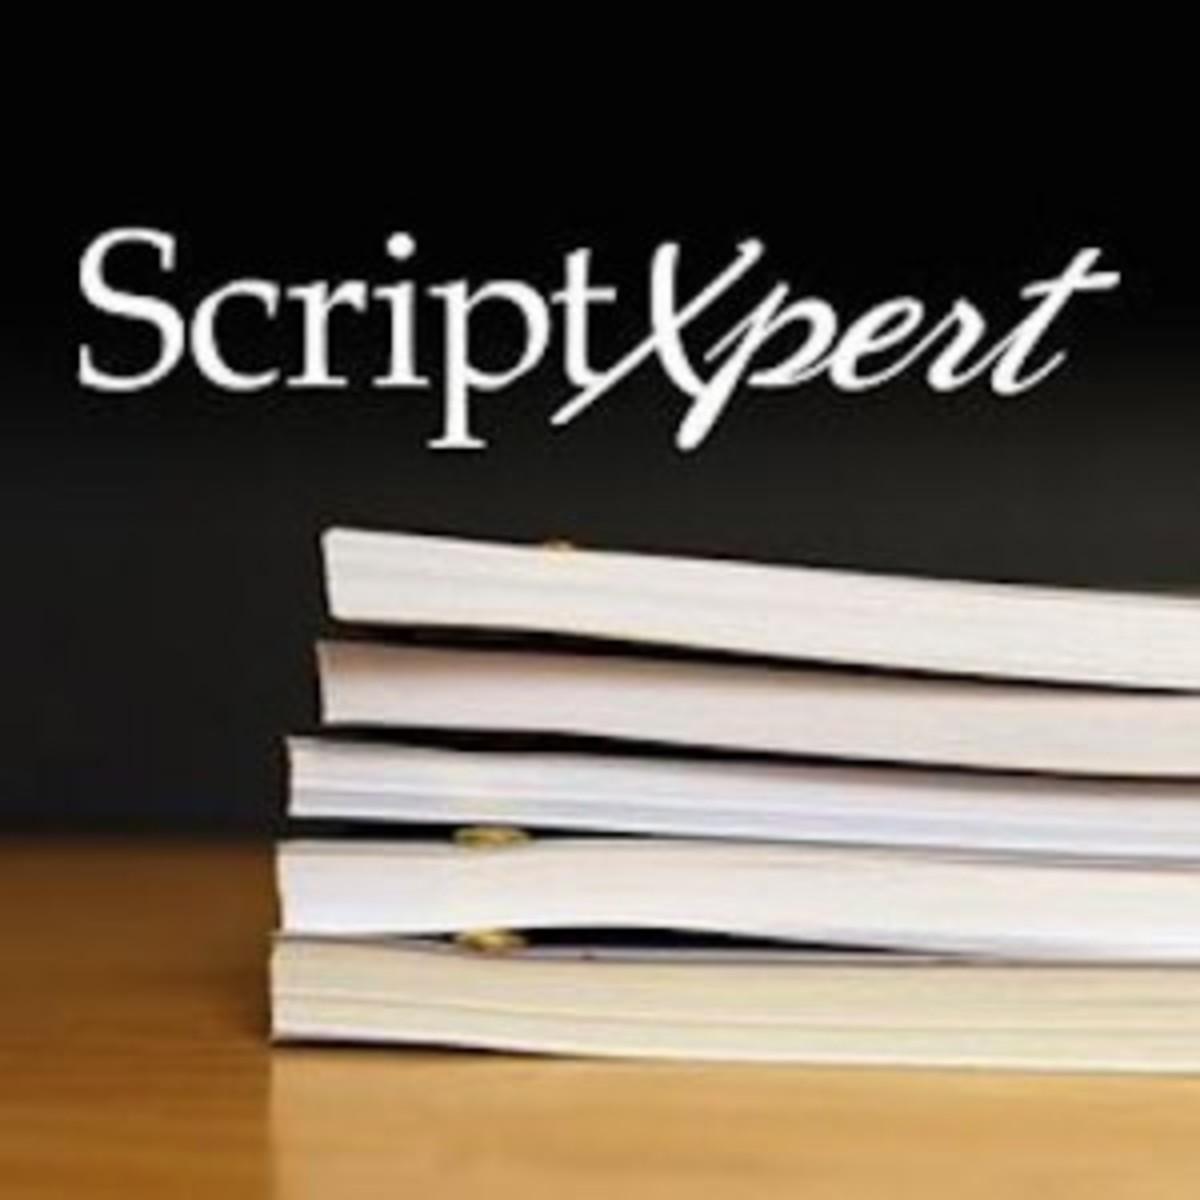 scriptxpert 3